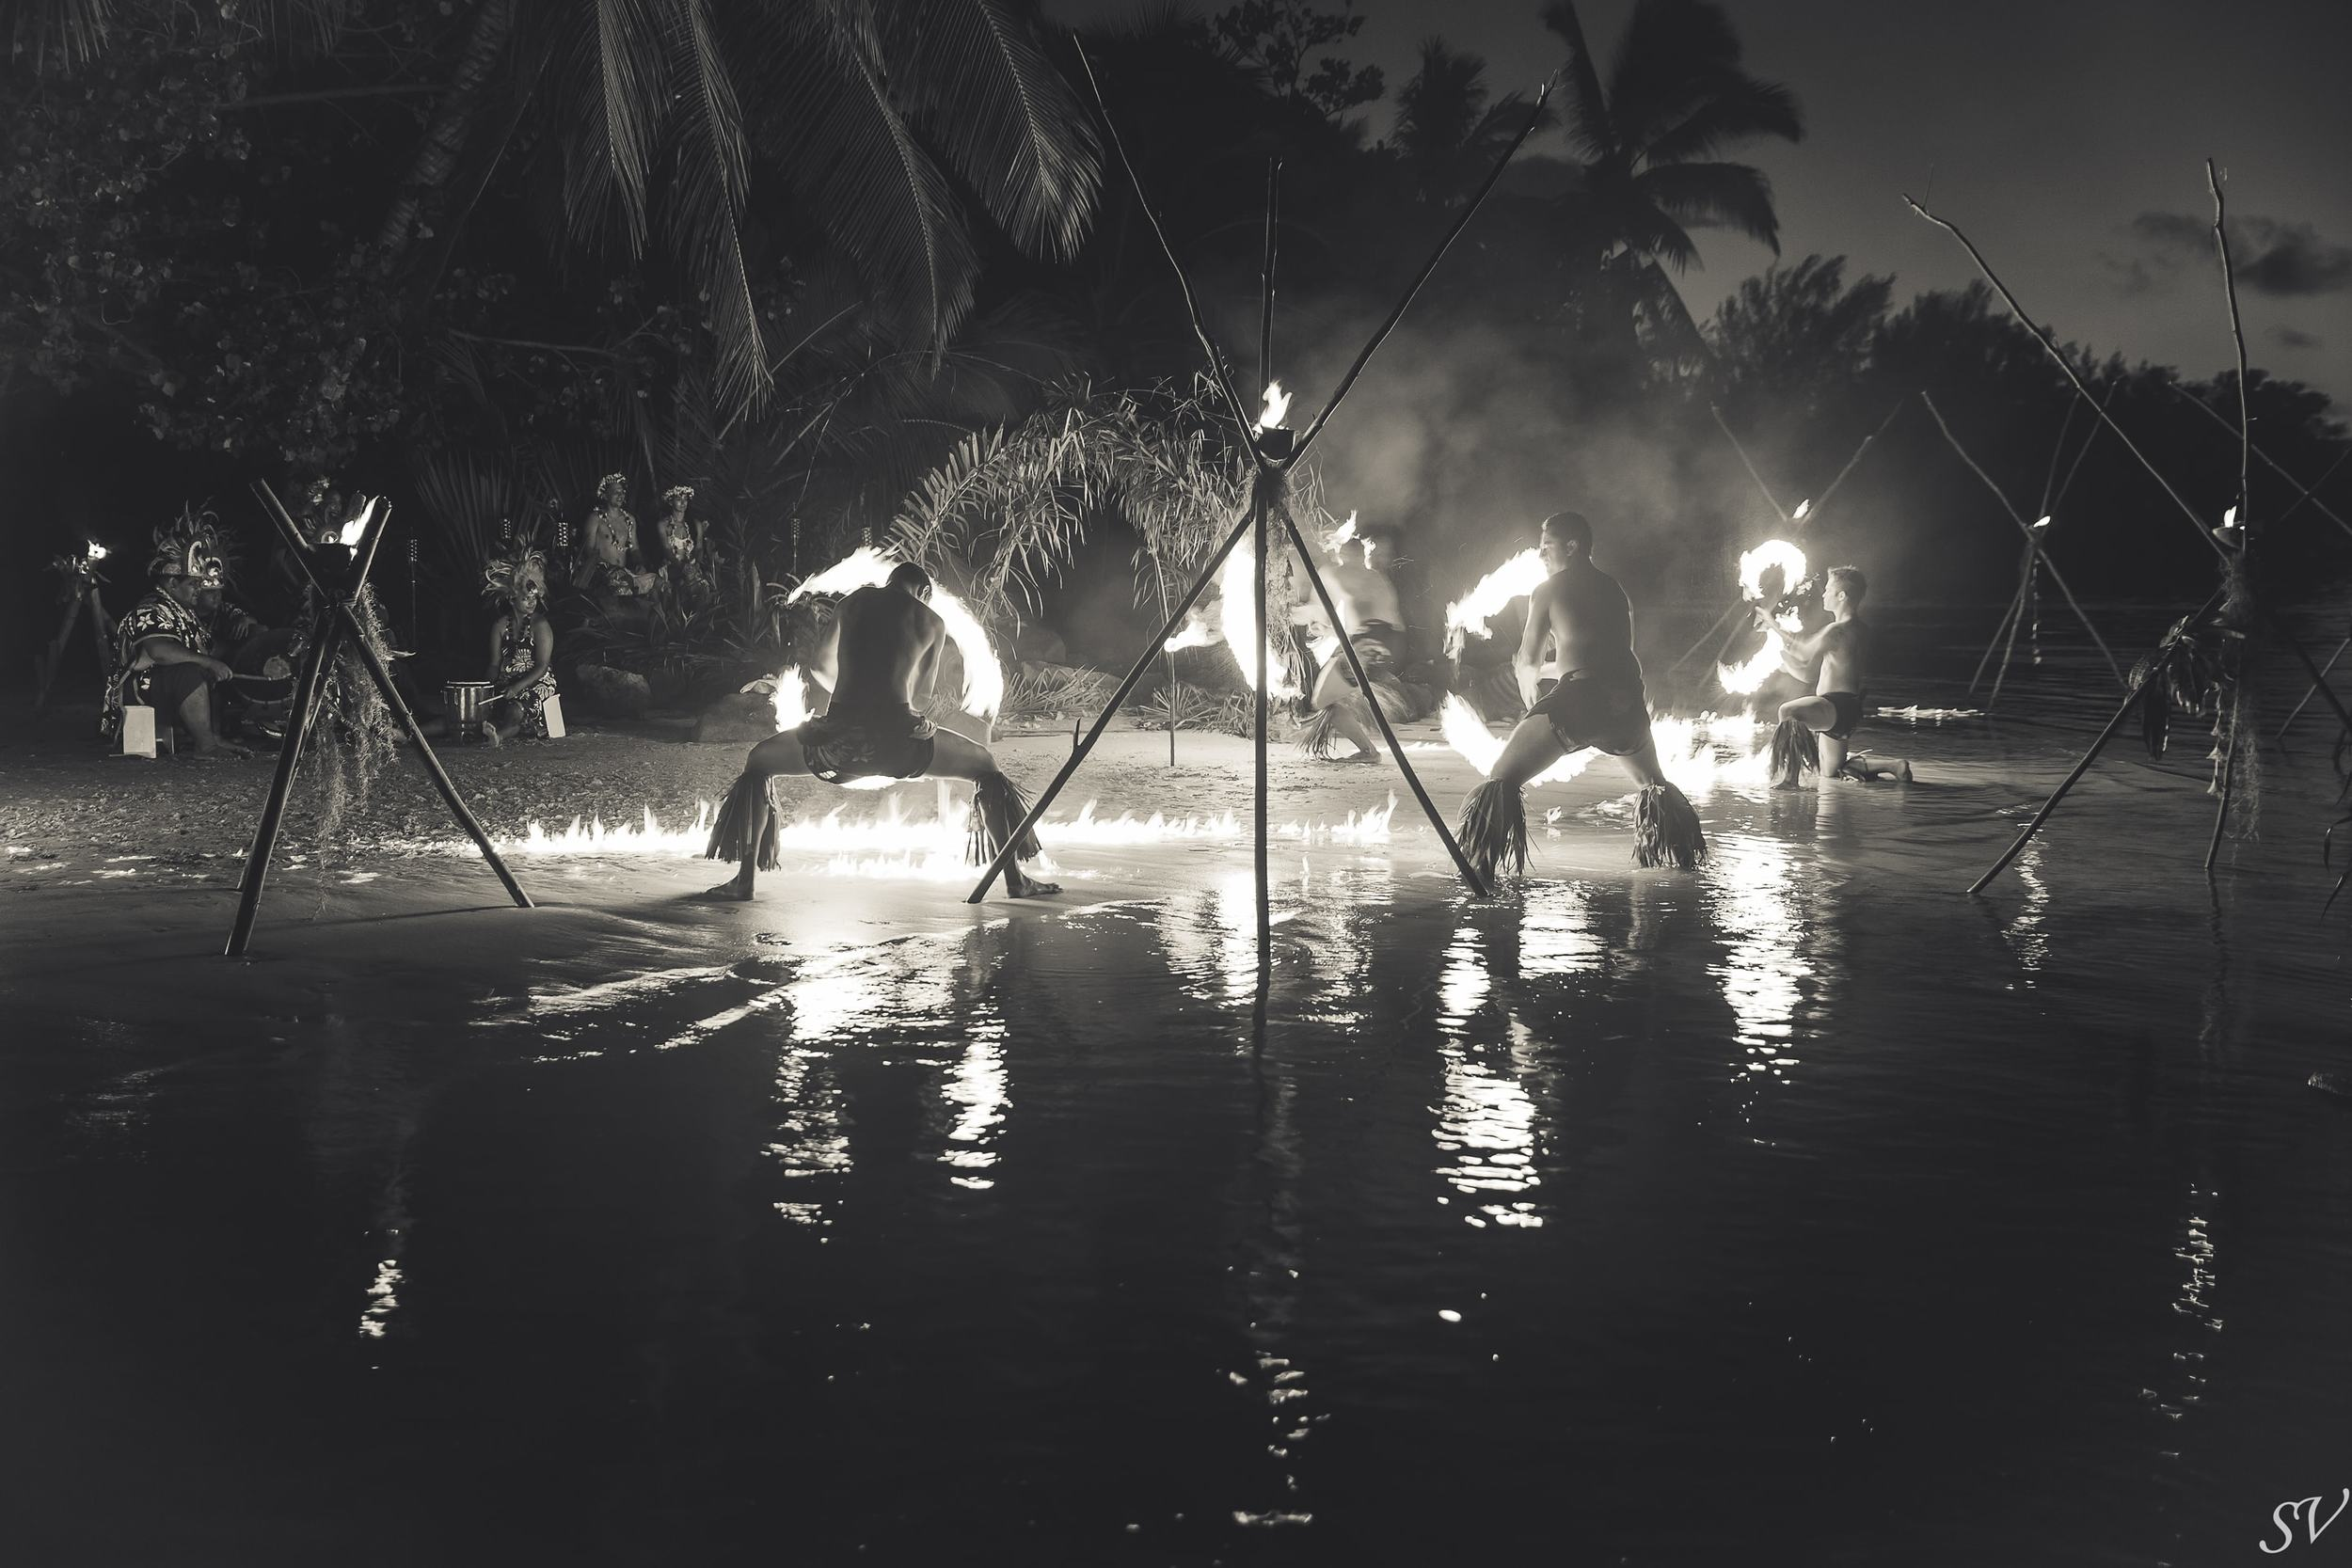 Fire dancing show in Polynesia